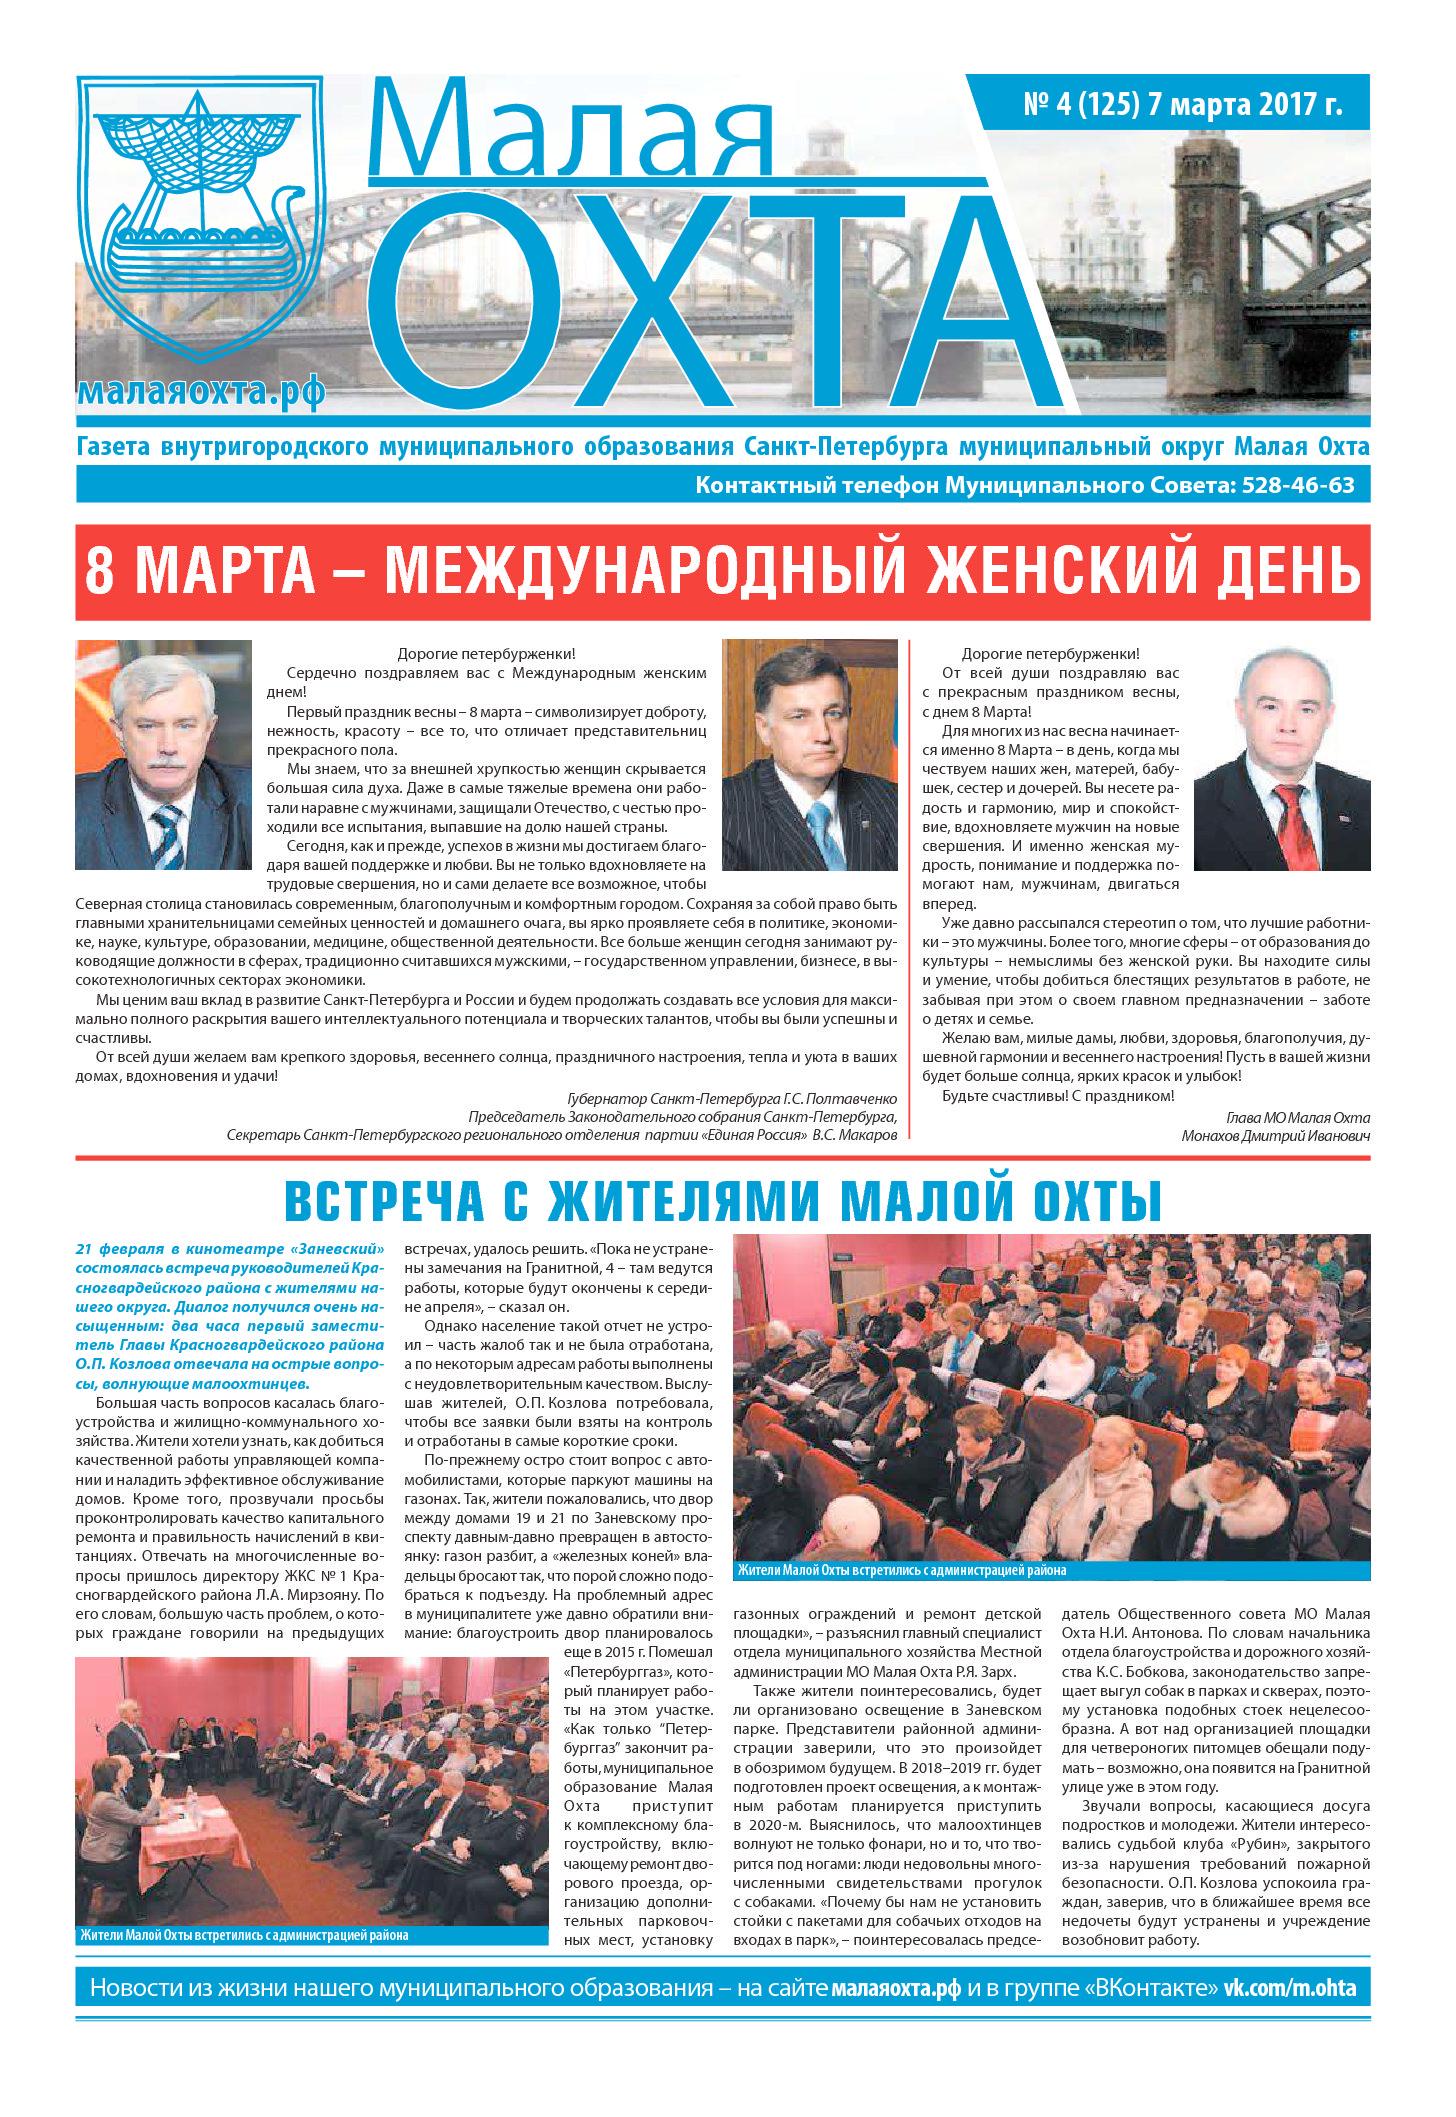 Газета № 04 2017